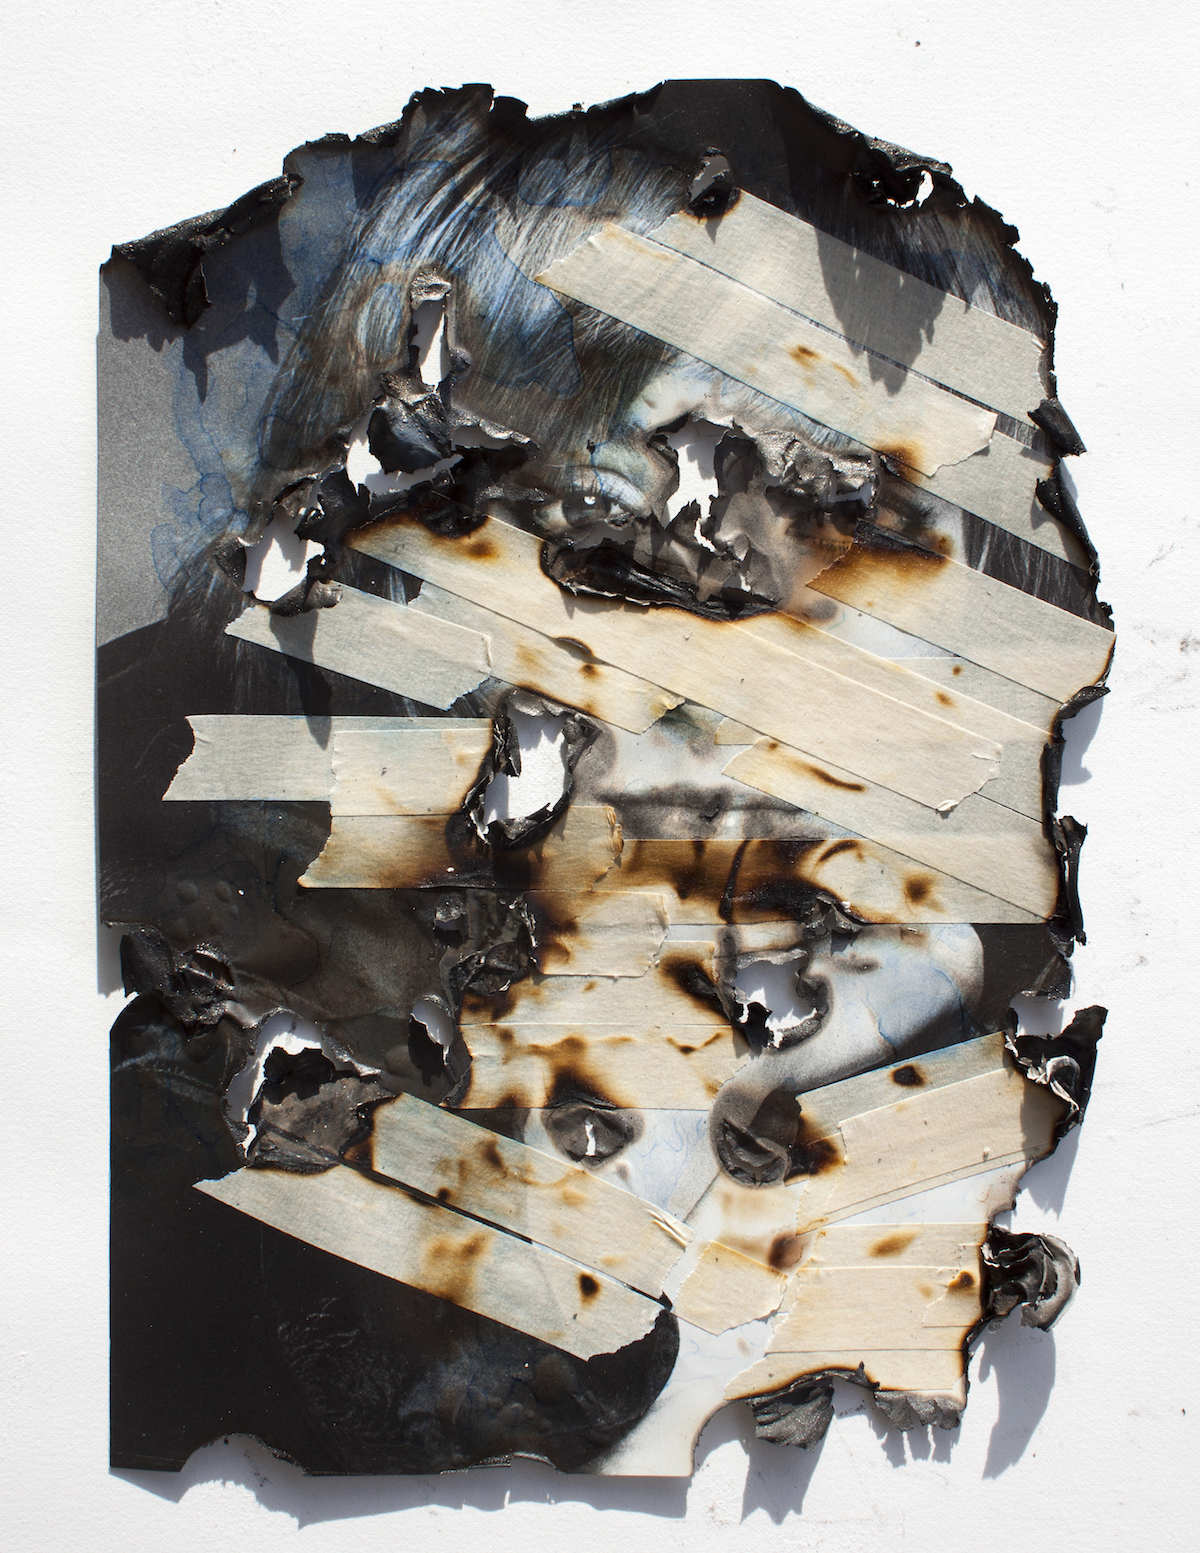 Jacob Spriggs Burnouts 04